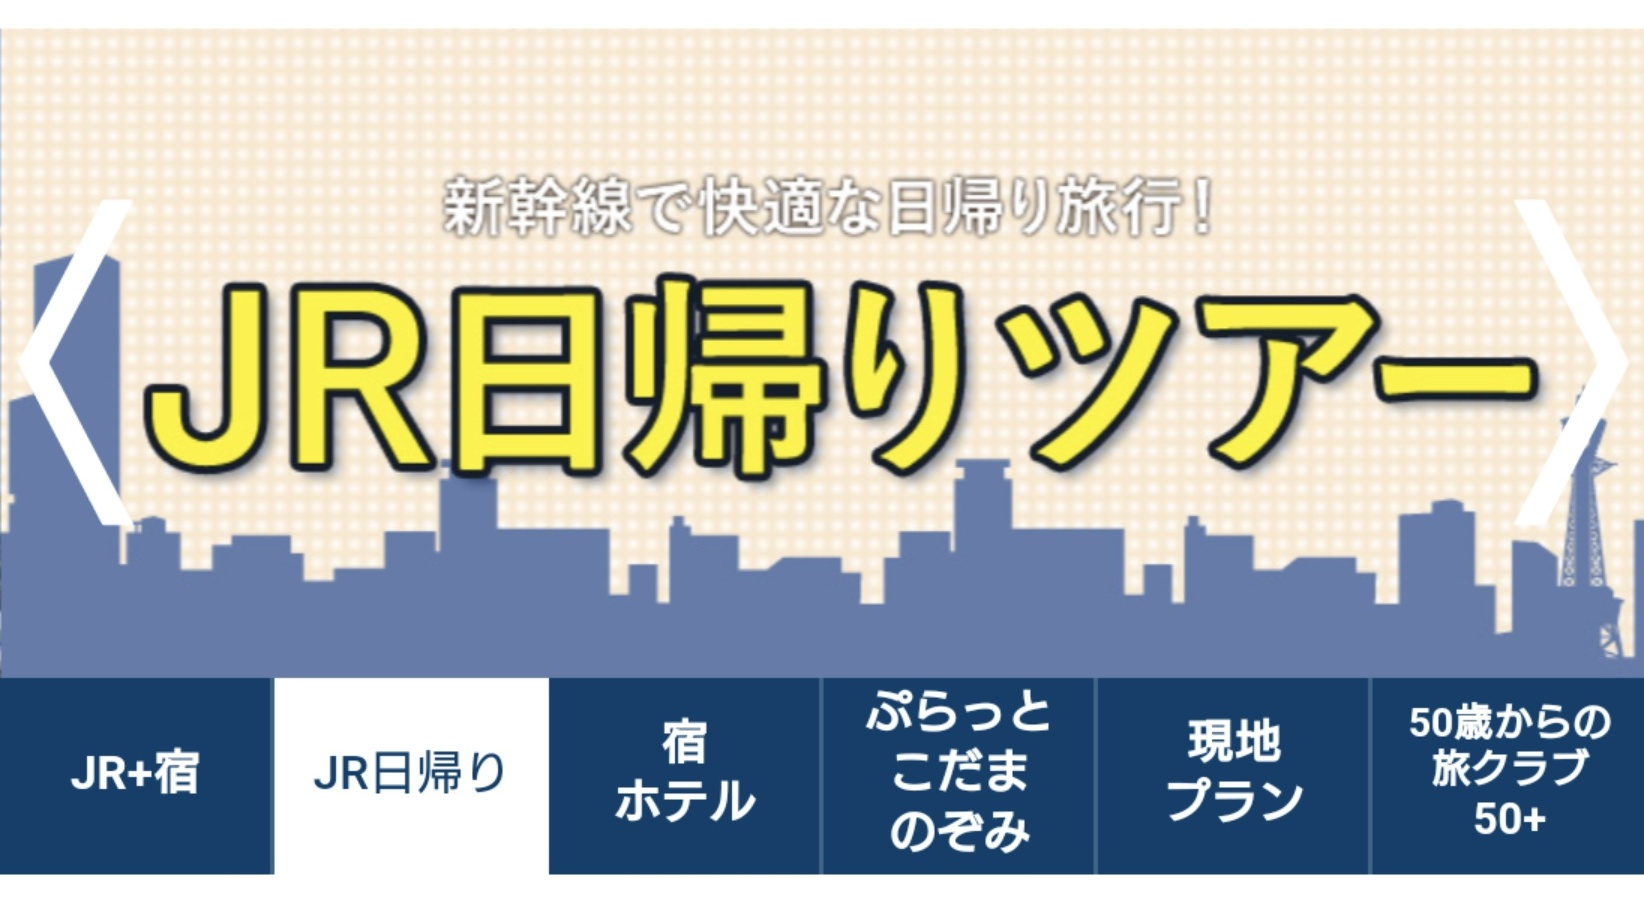 【GoToトラベル】東京・名古屋・仙台が格安 日帰りでの使いやすさは?